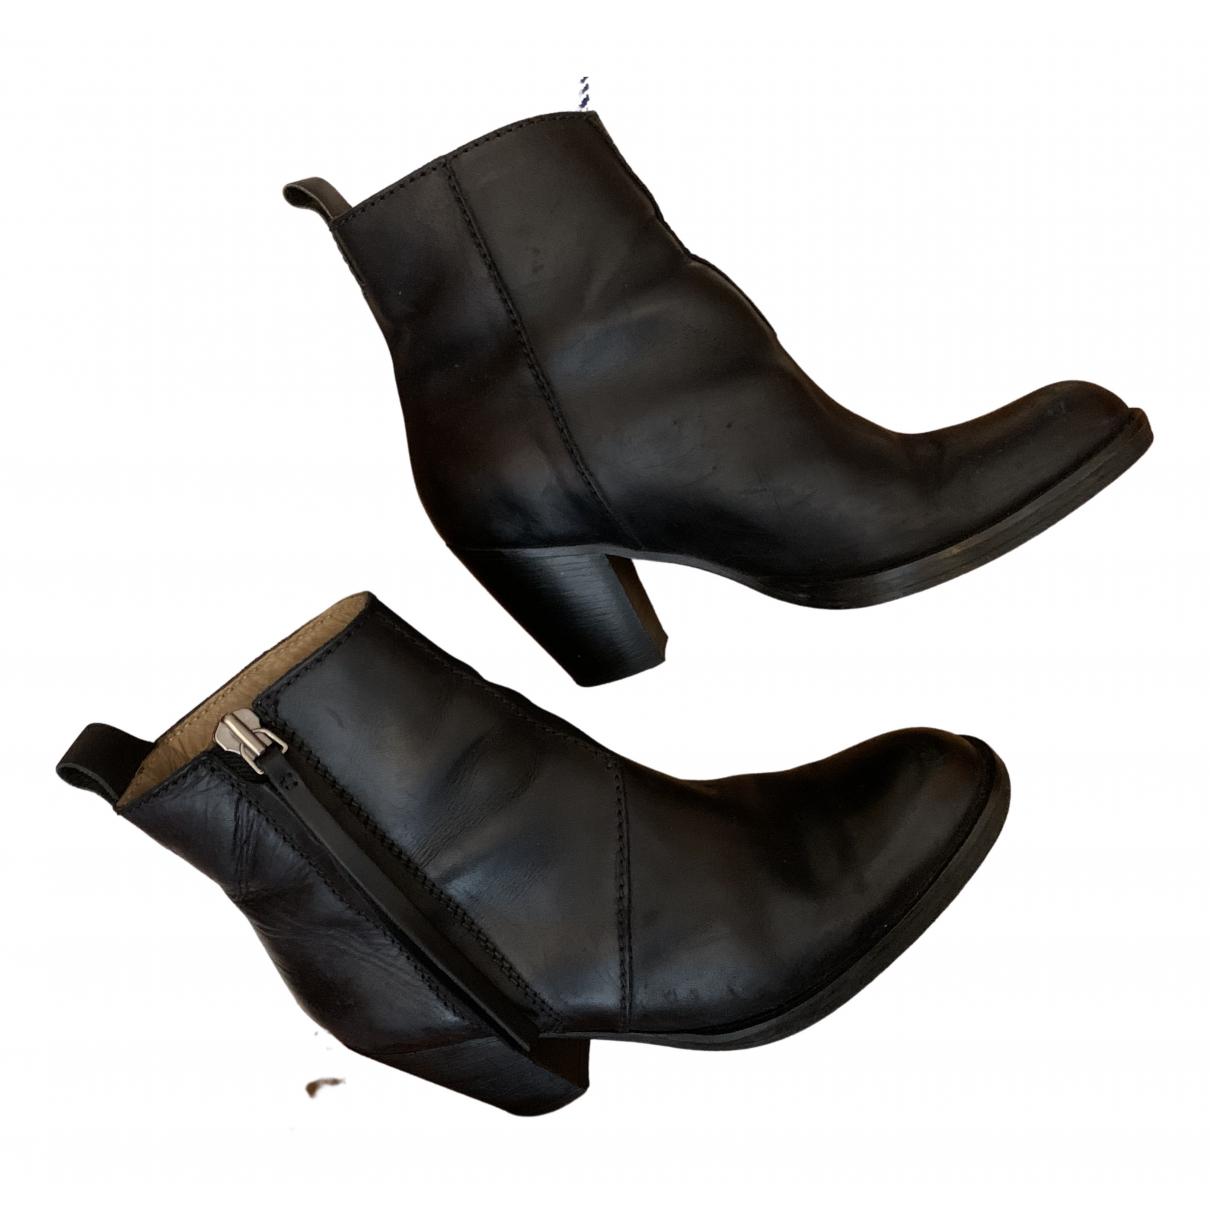 Acne Studios Pistol Black Leather Ankle boots for Women 39 EU